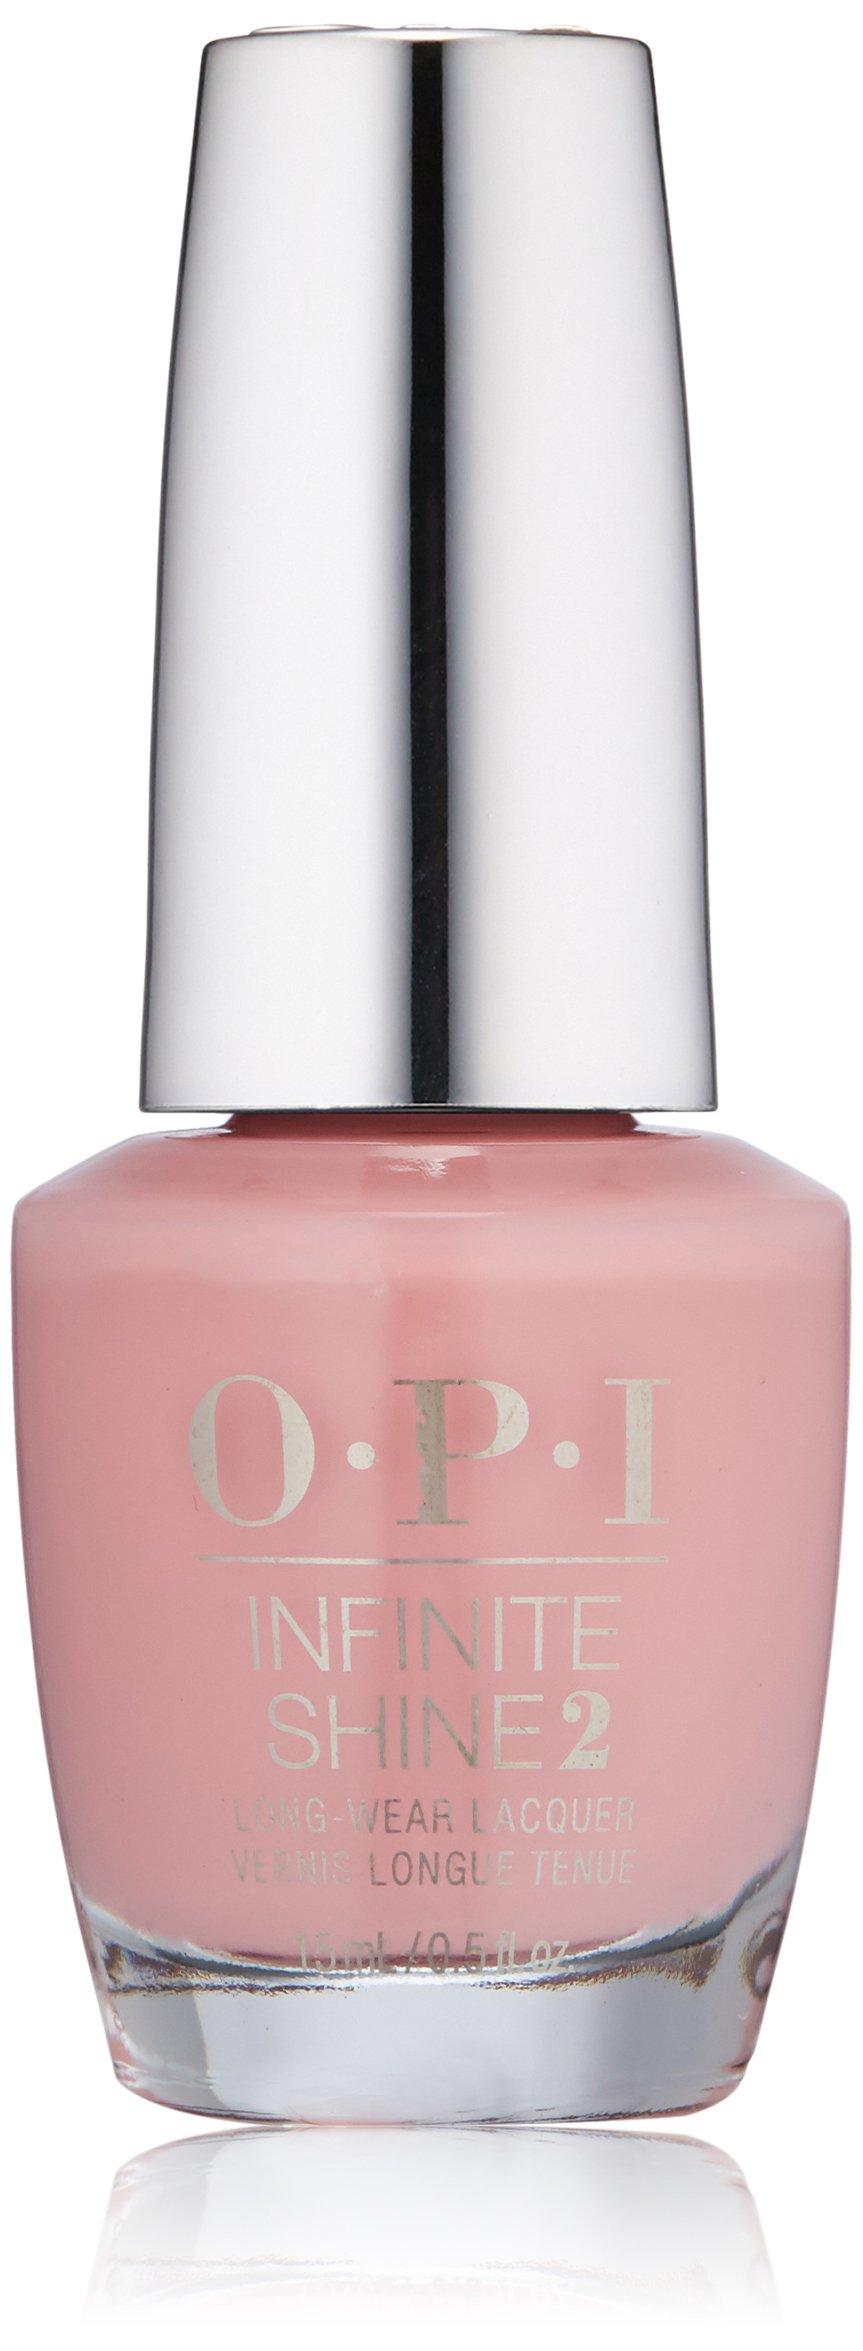 OPI Infinite Shine, Pink Ladies Rule The School, 0.5 fl. oz.